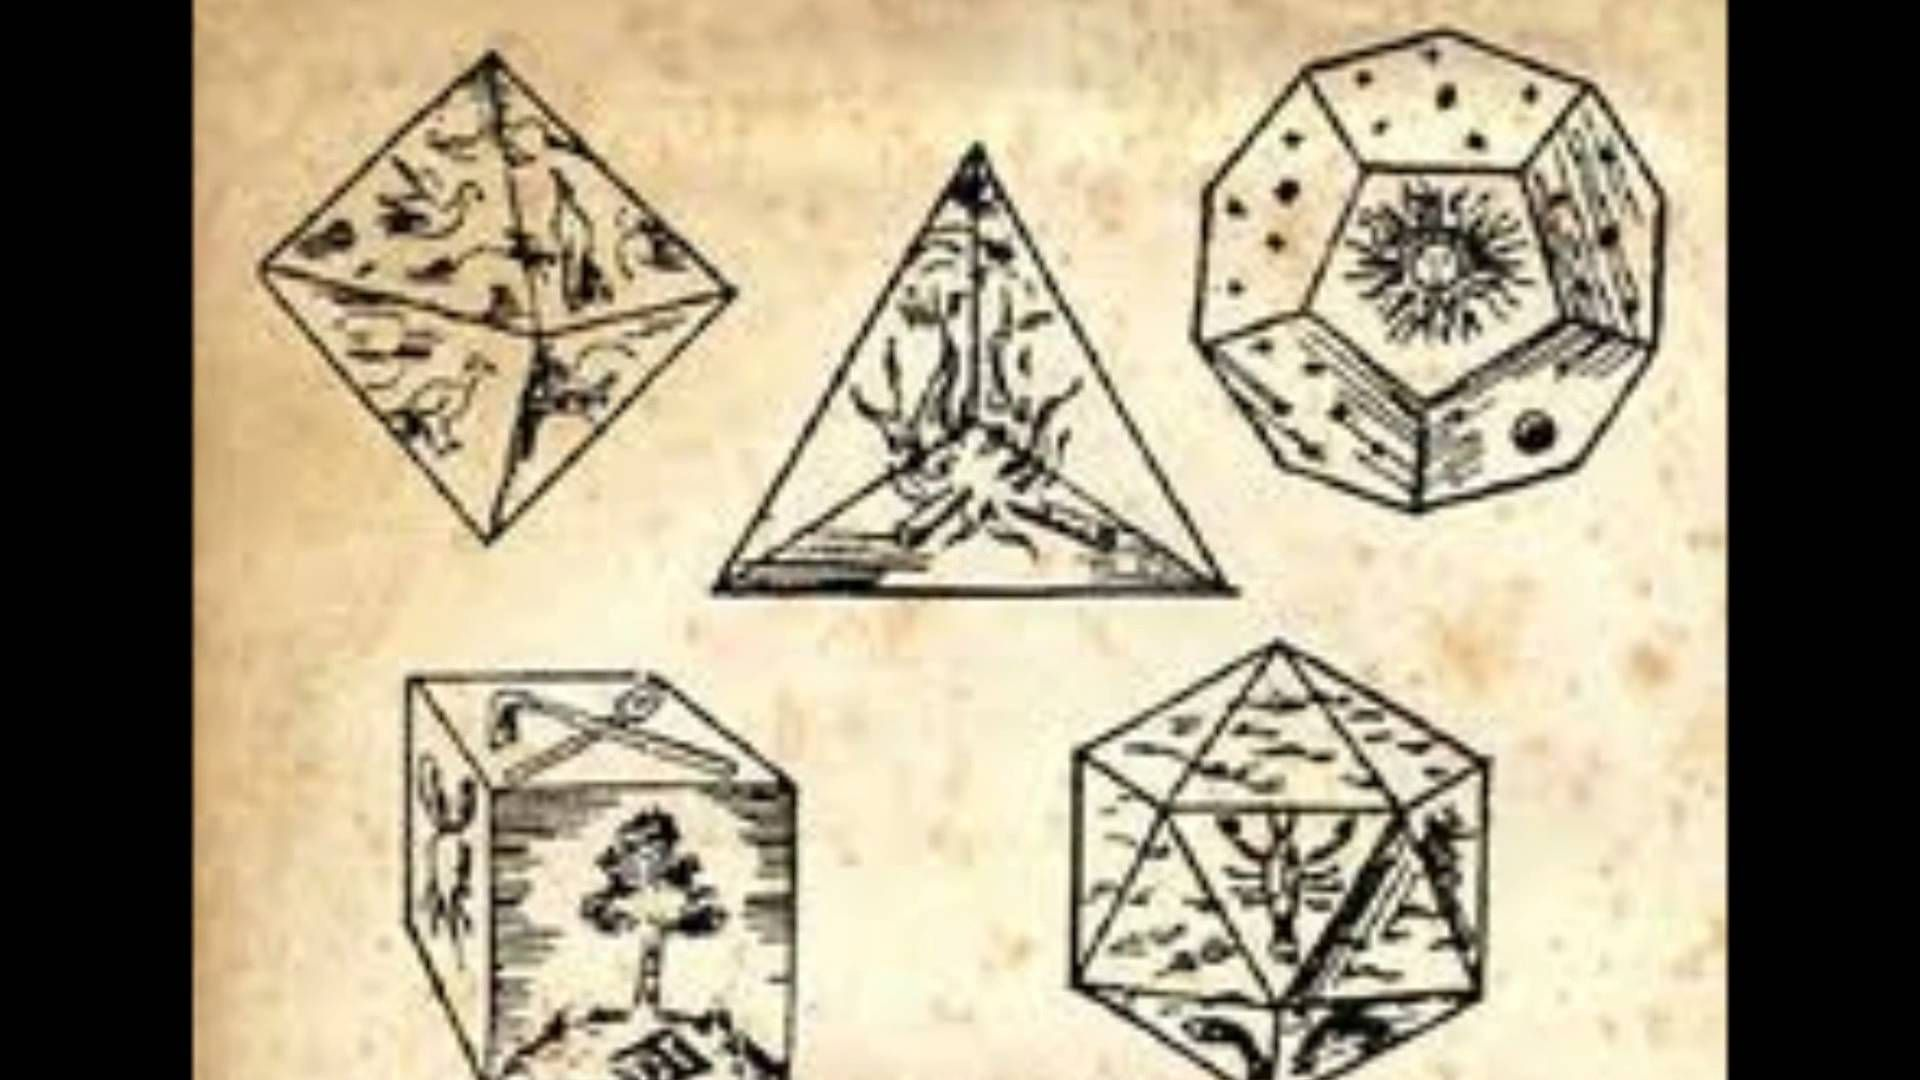 Solidi Platonici   Solido platonico, Geometria sacra, Matematica